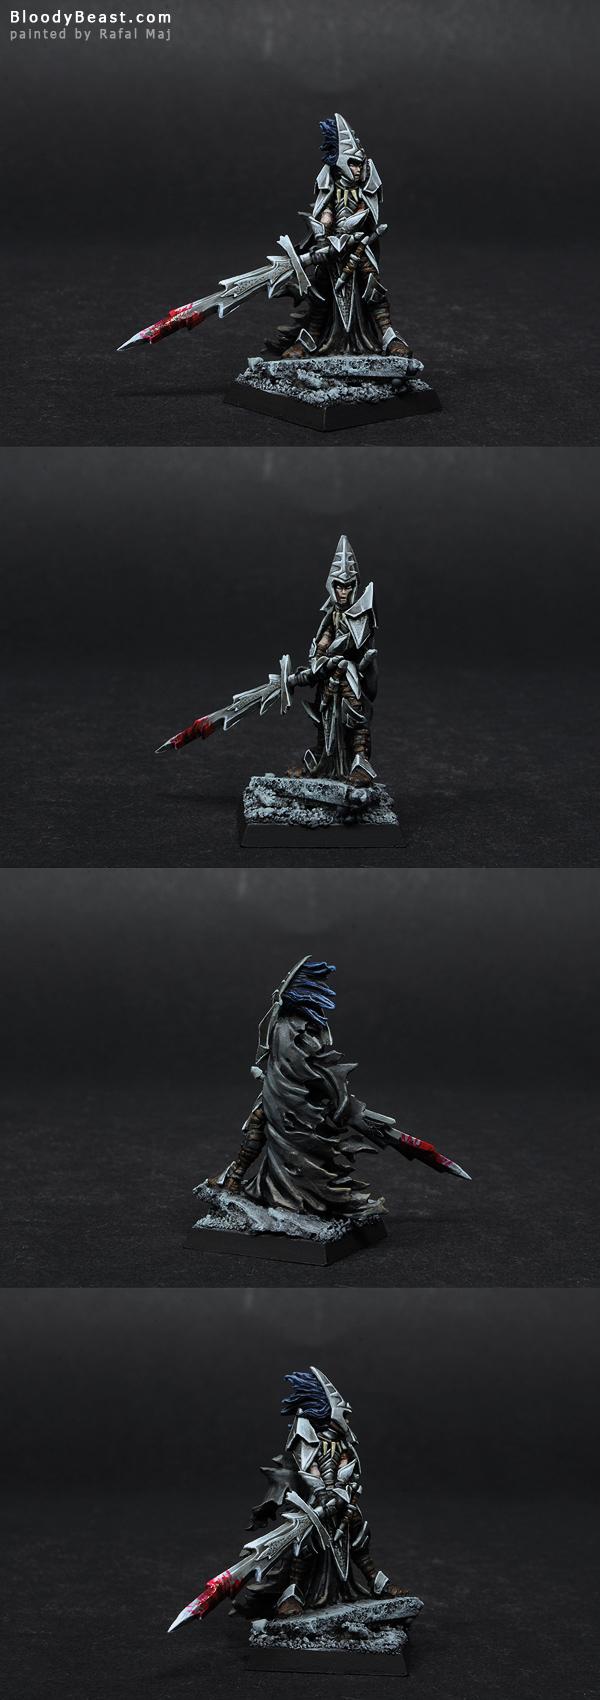 Darkreach Avrix Dirthe Champion painted by Rafal Maj (BloodyBeast.com)